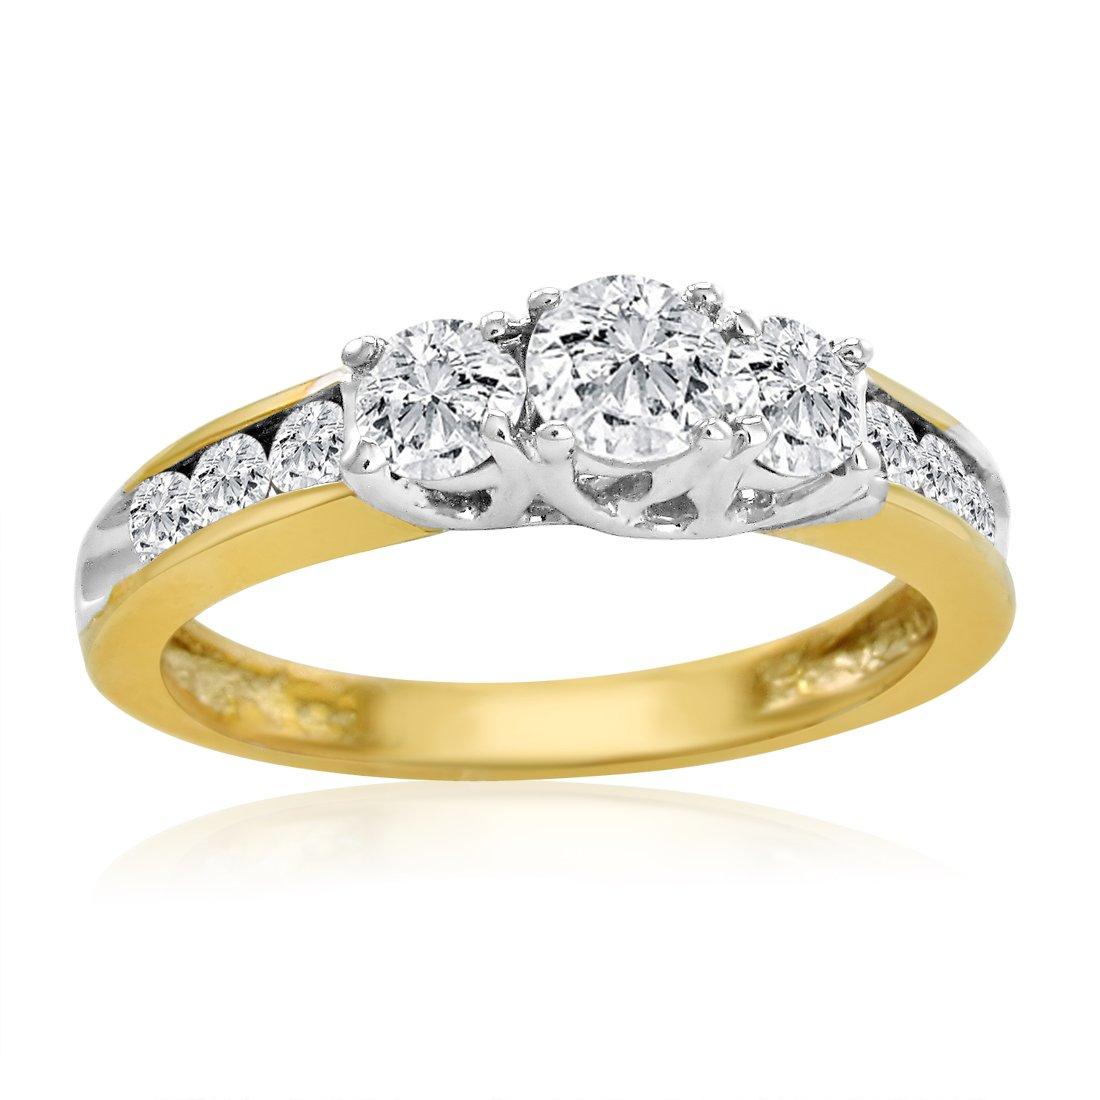 IGI Certified 10K Yellow Gold Three Stone Plus Diamond Anniversary Ring 1ct total weight ( Available Sizes 5-8) sz7